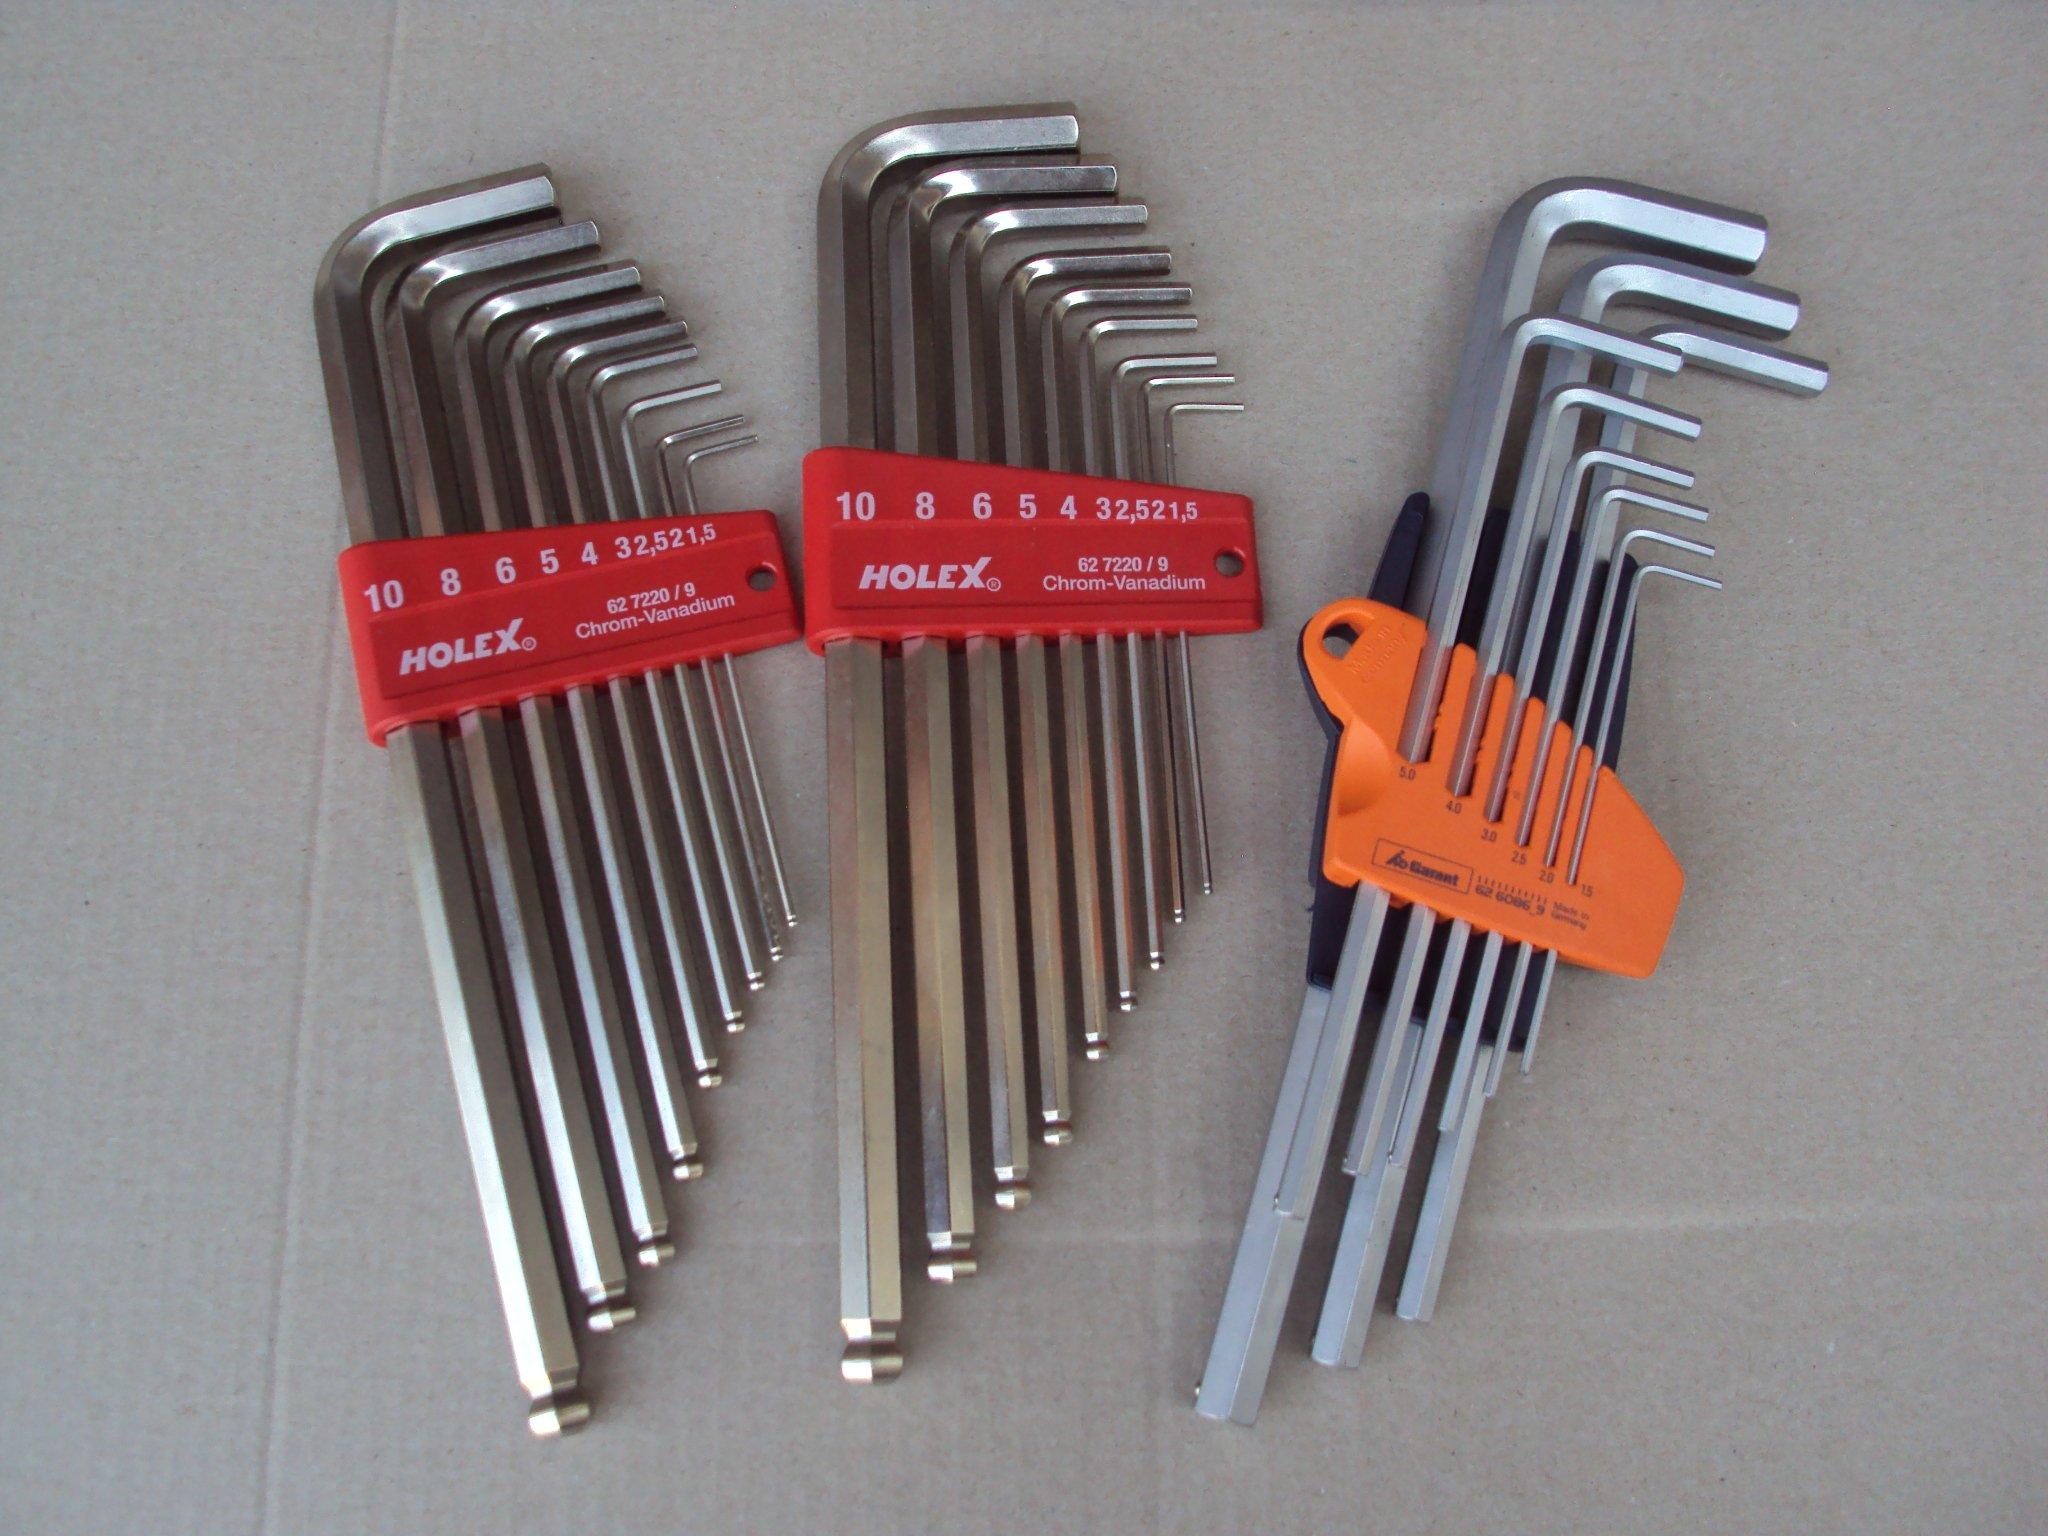 Klucze imbusowe imbusy HoleX od 1,5 do 10mm